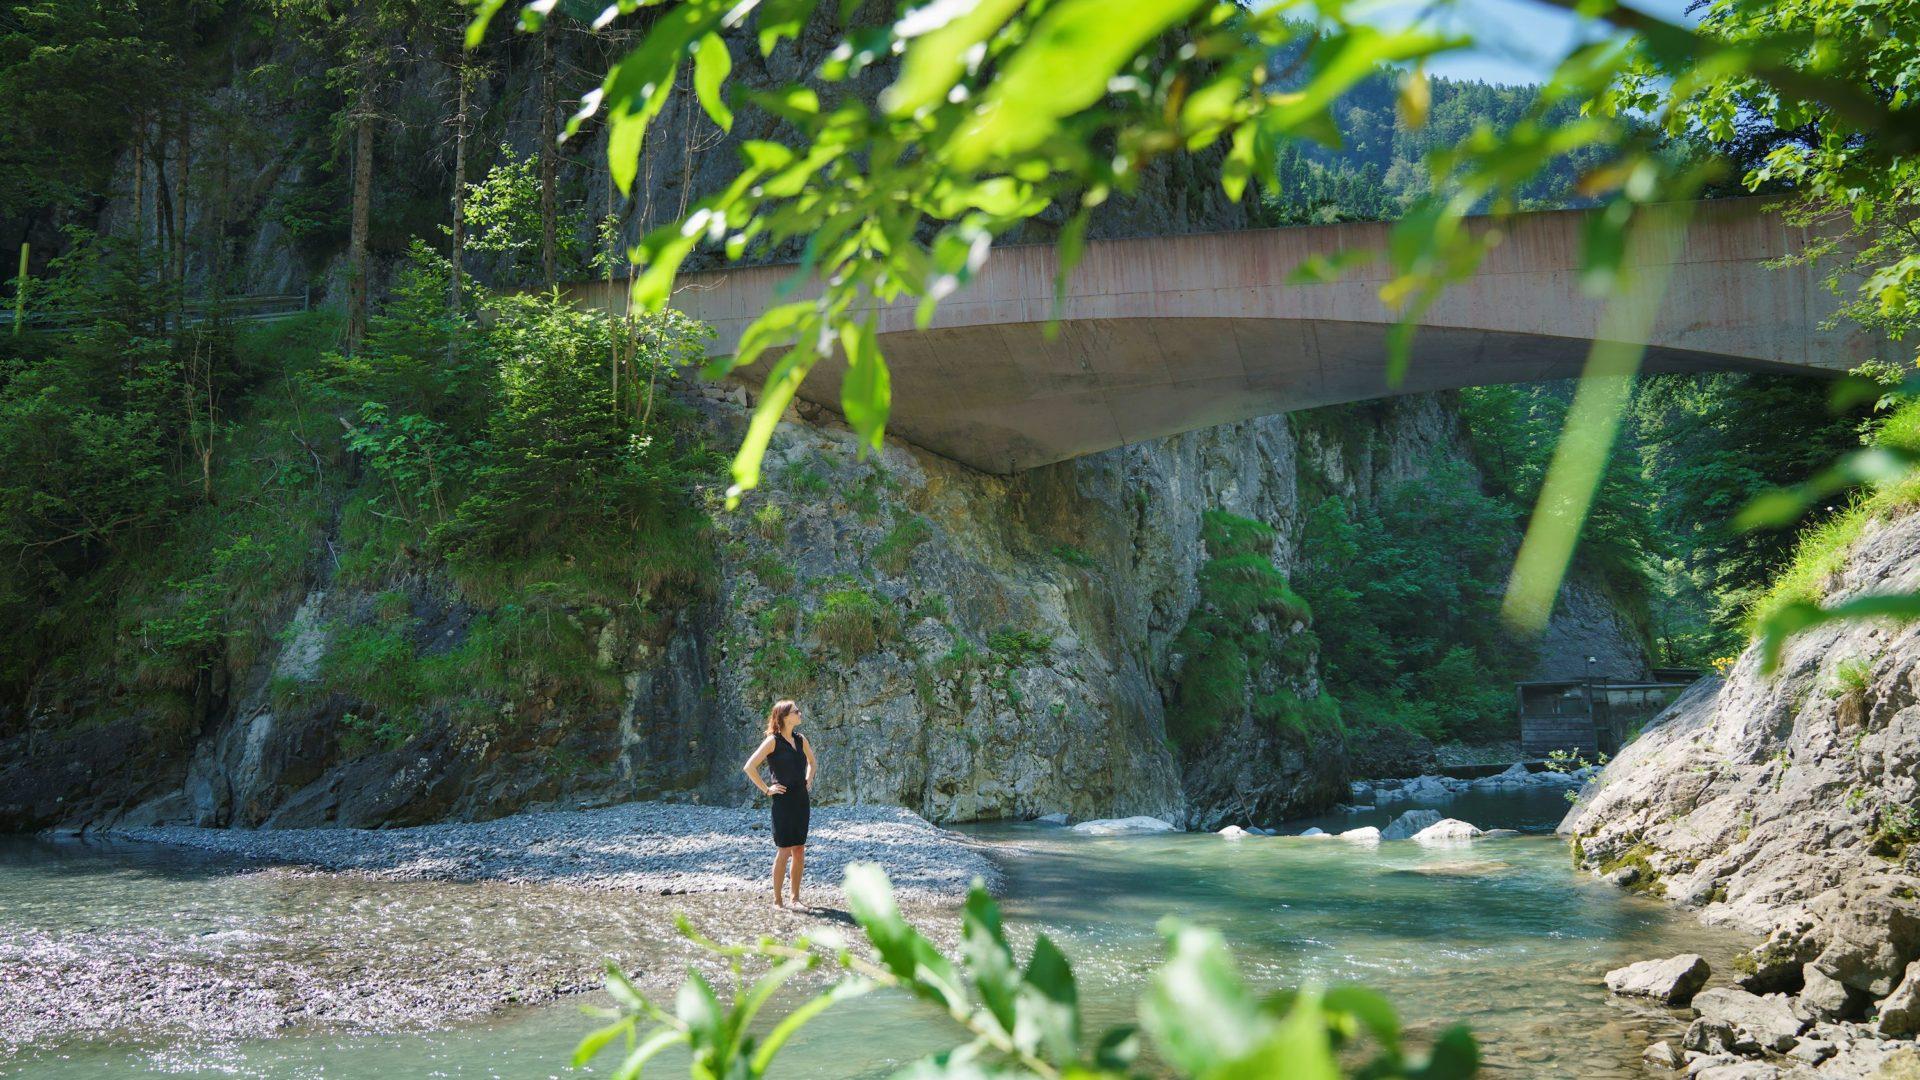 Verena Konrad, Schanerloch Brücke, Ebnit, Dornbirn (c) Dietmar Denger / Vorarlberg Tourismus